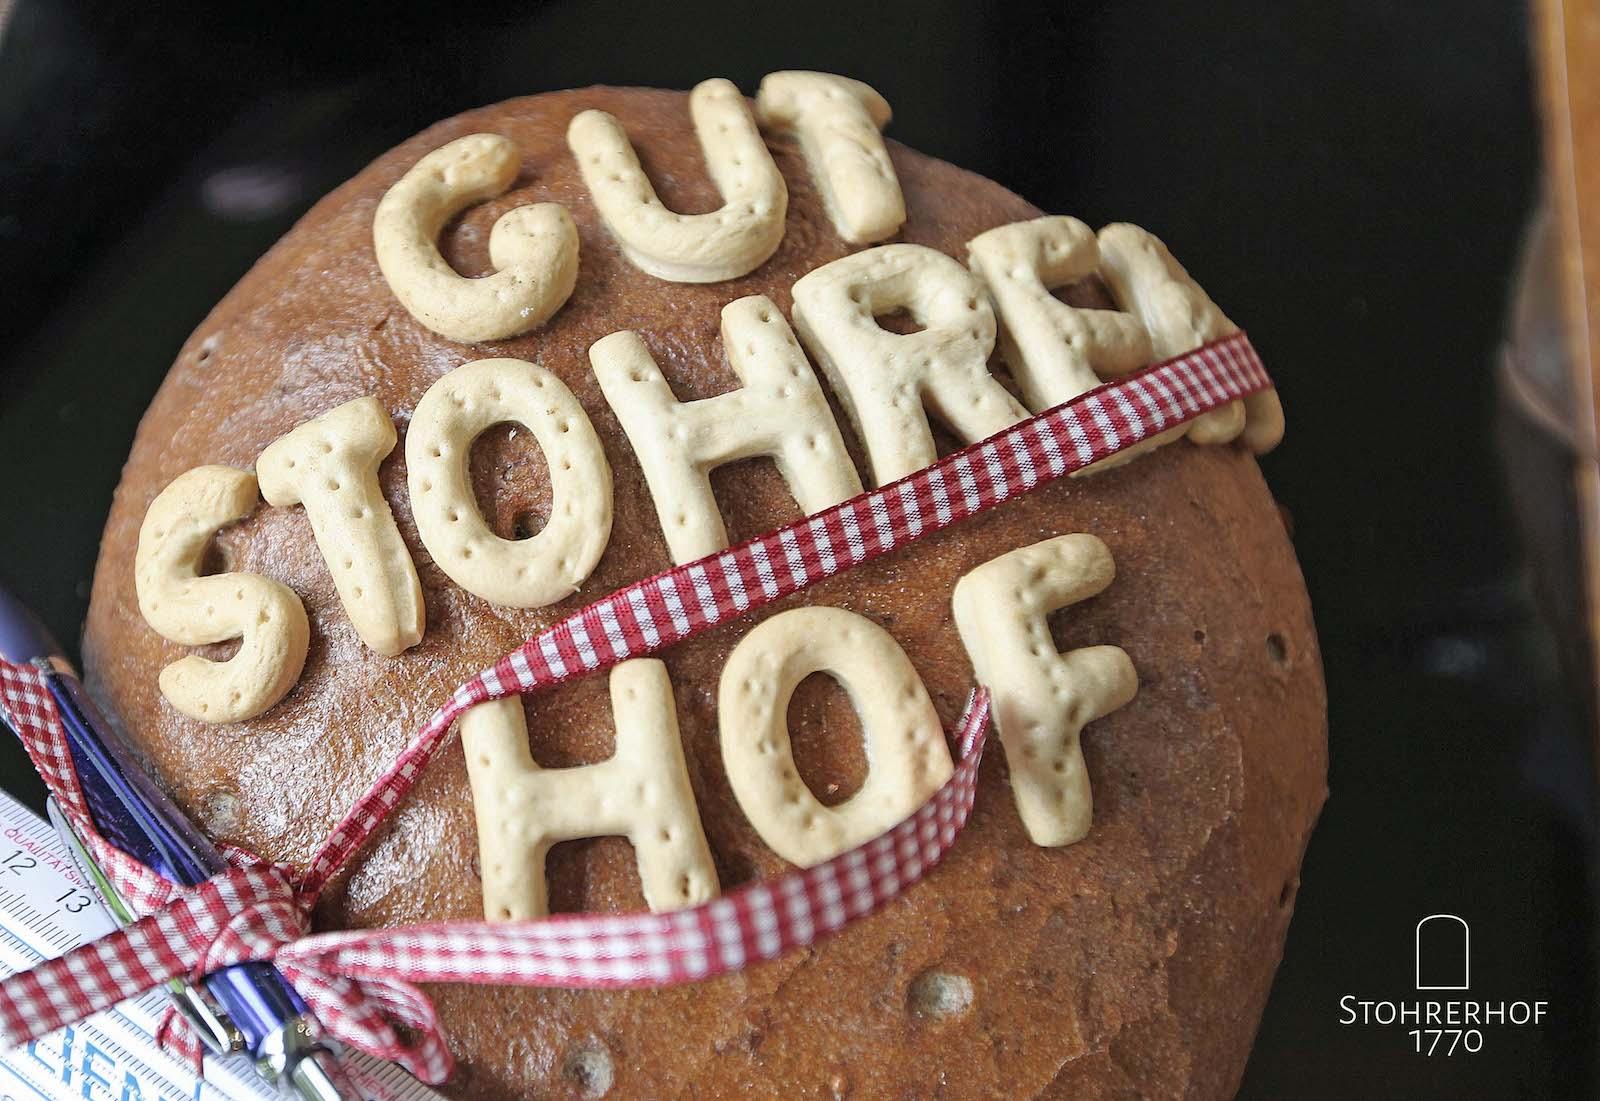 8-Brot-Stohrerhof-K